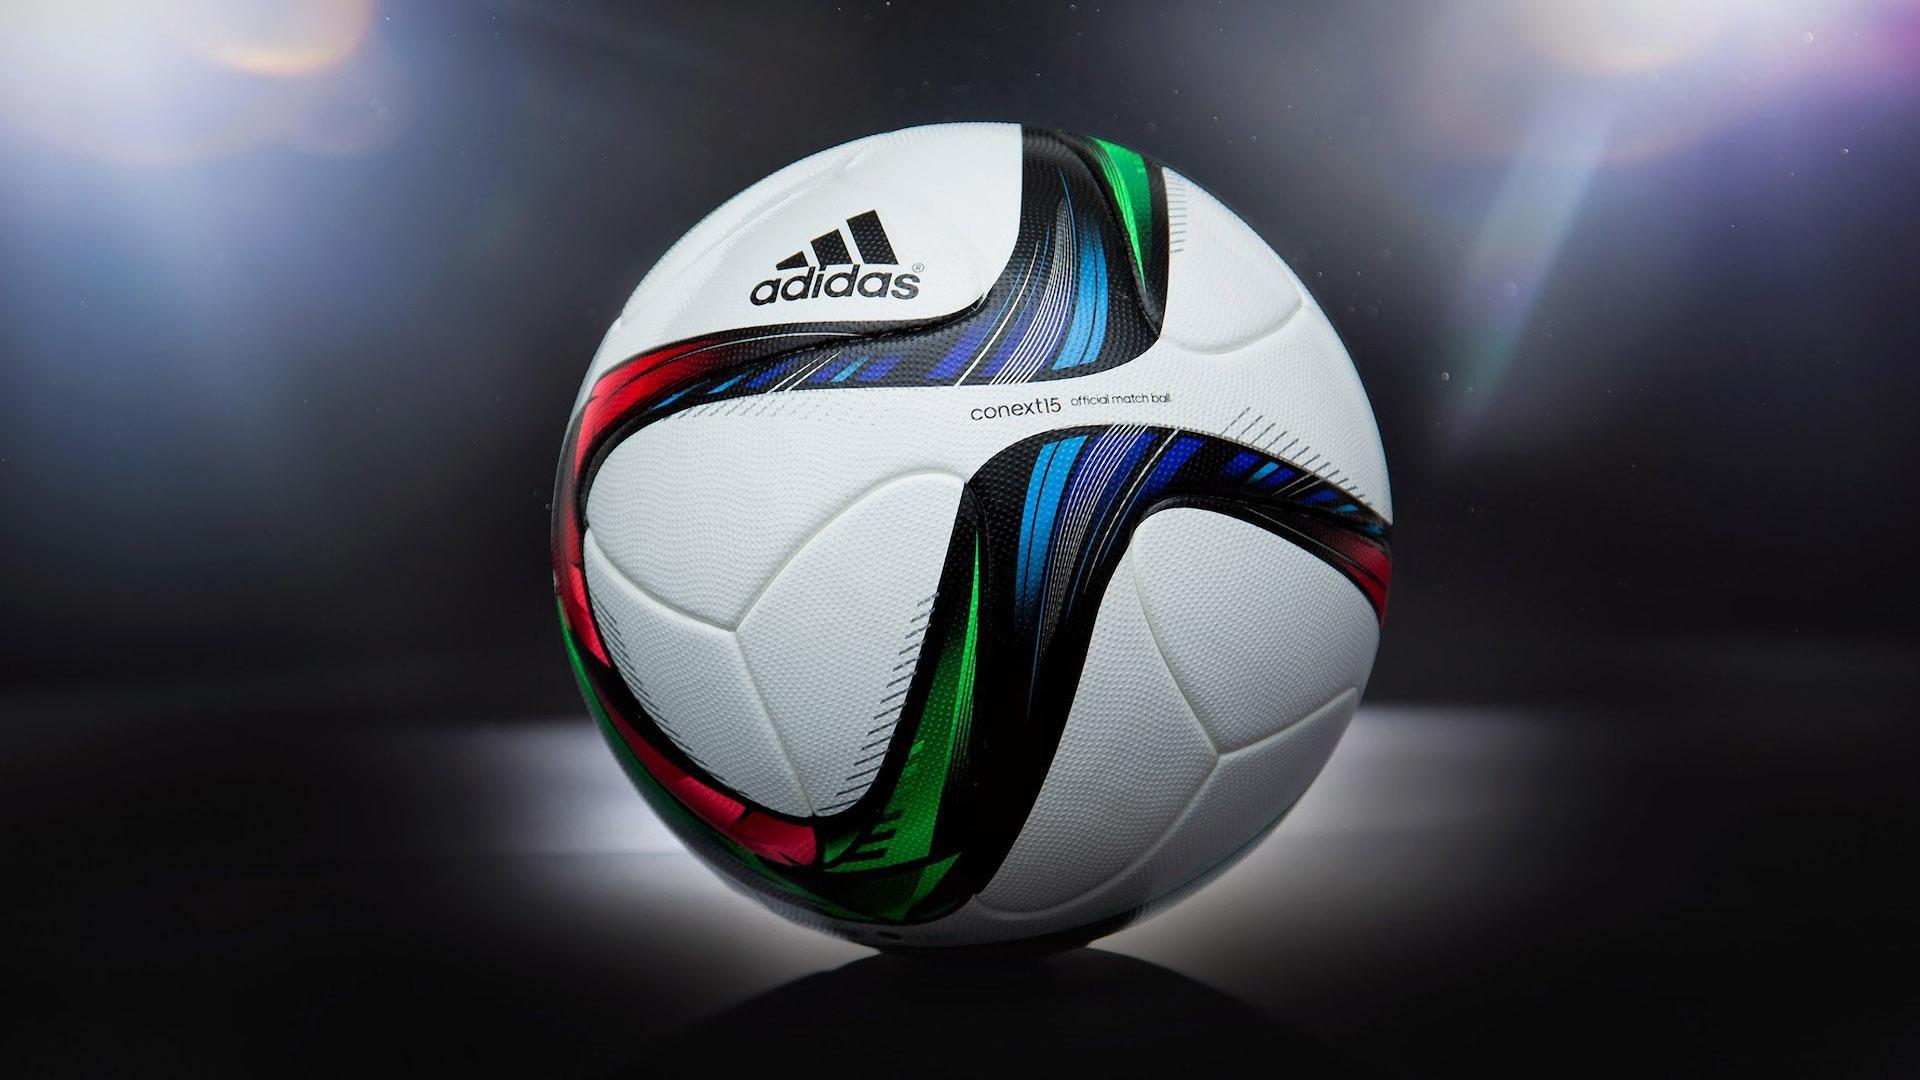 wallpaper.wiki-Adidas-Conext-Soccer-Wallpaper-PIC-WPC0014208